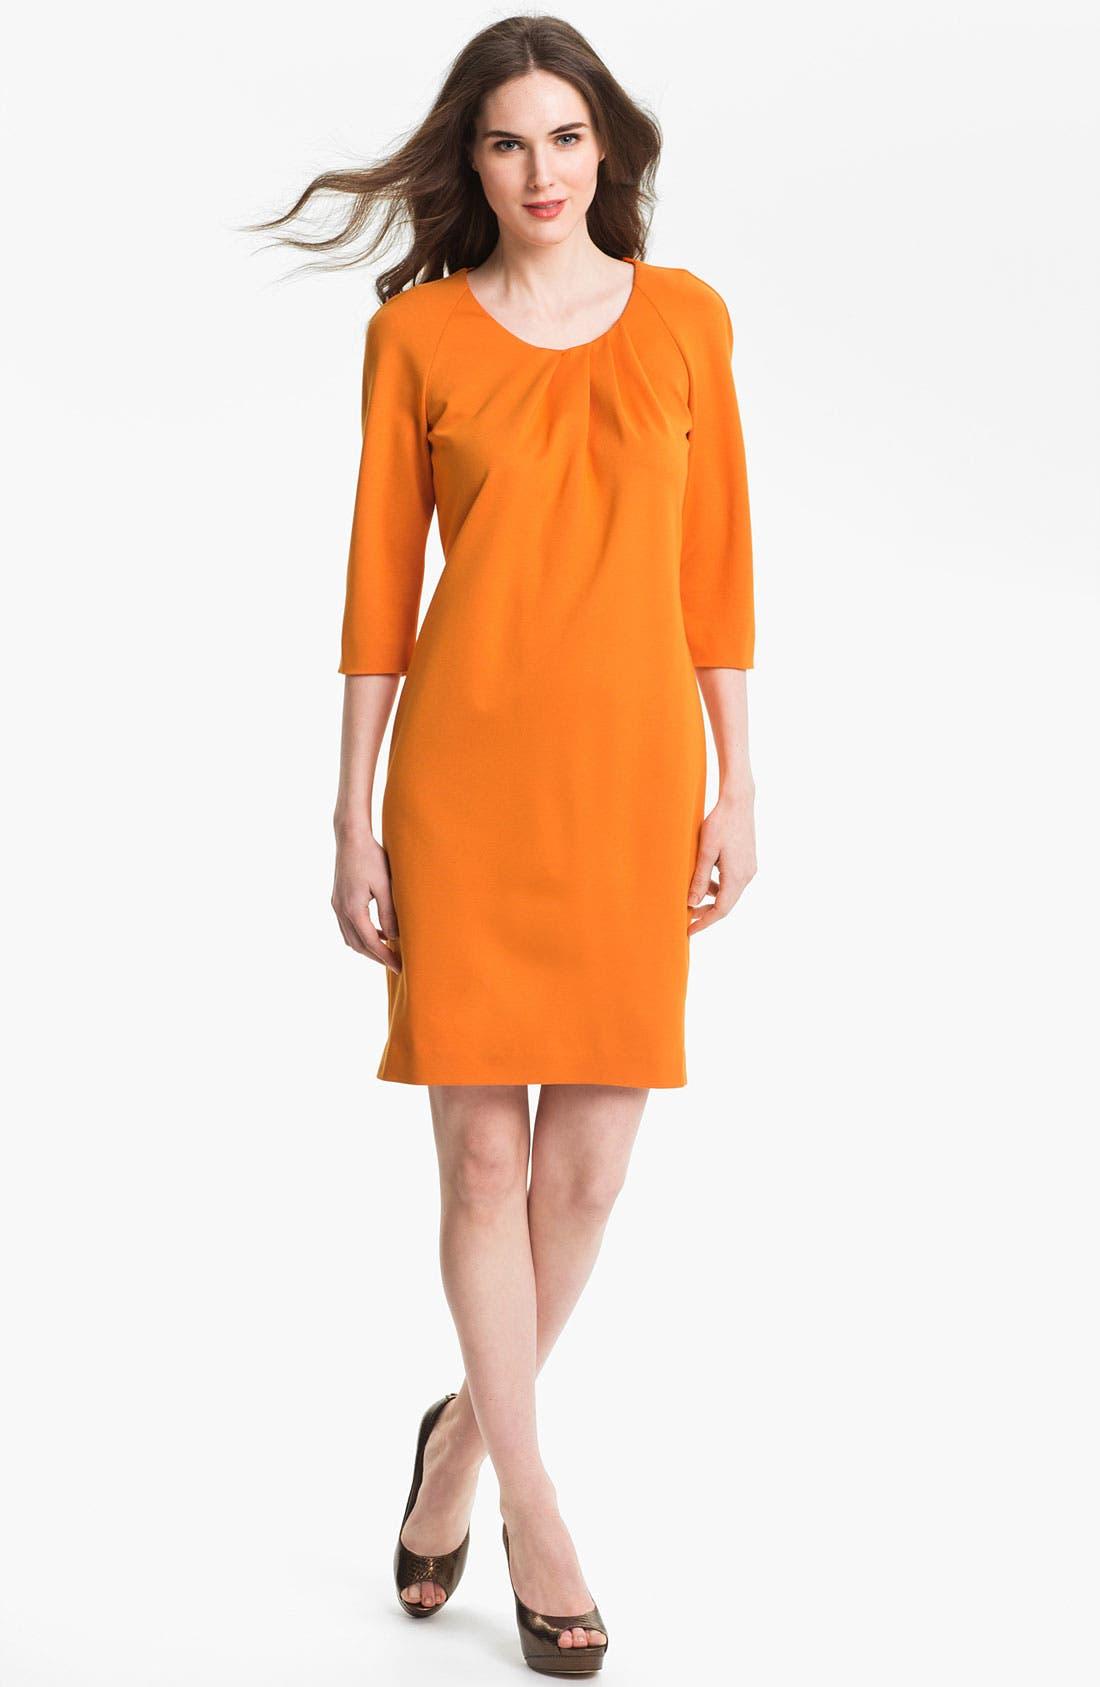 Alternate Image 1 Selected - BOSS Black 'Halay' Dress (Online Only)